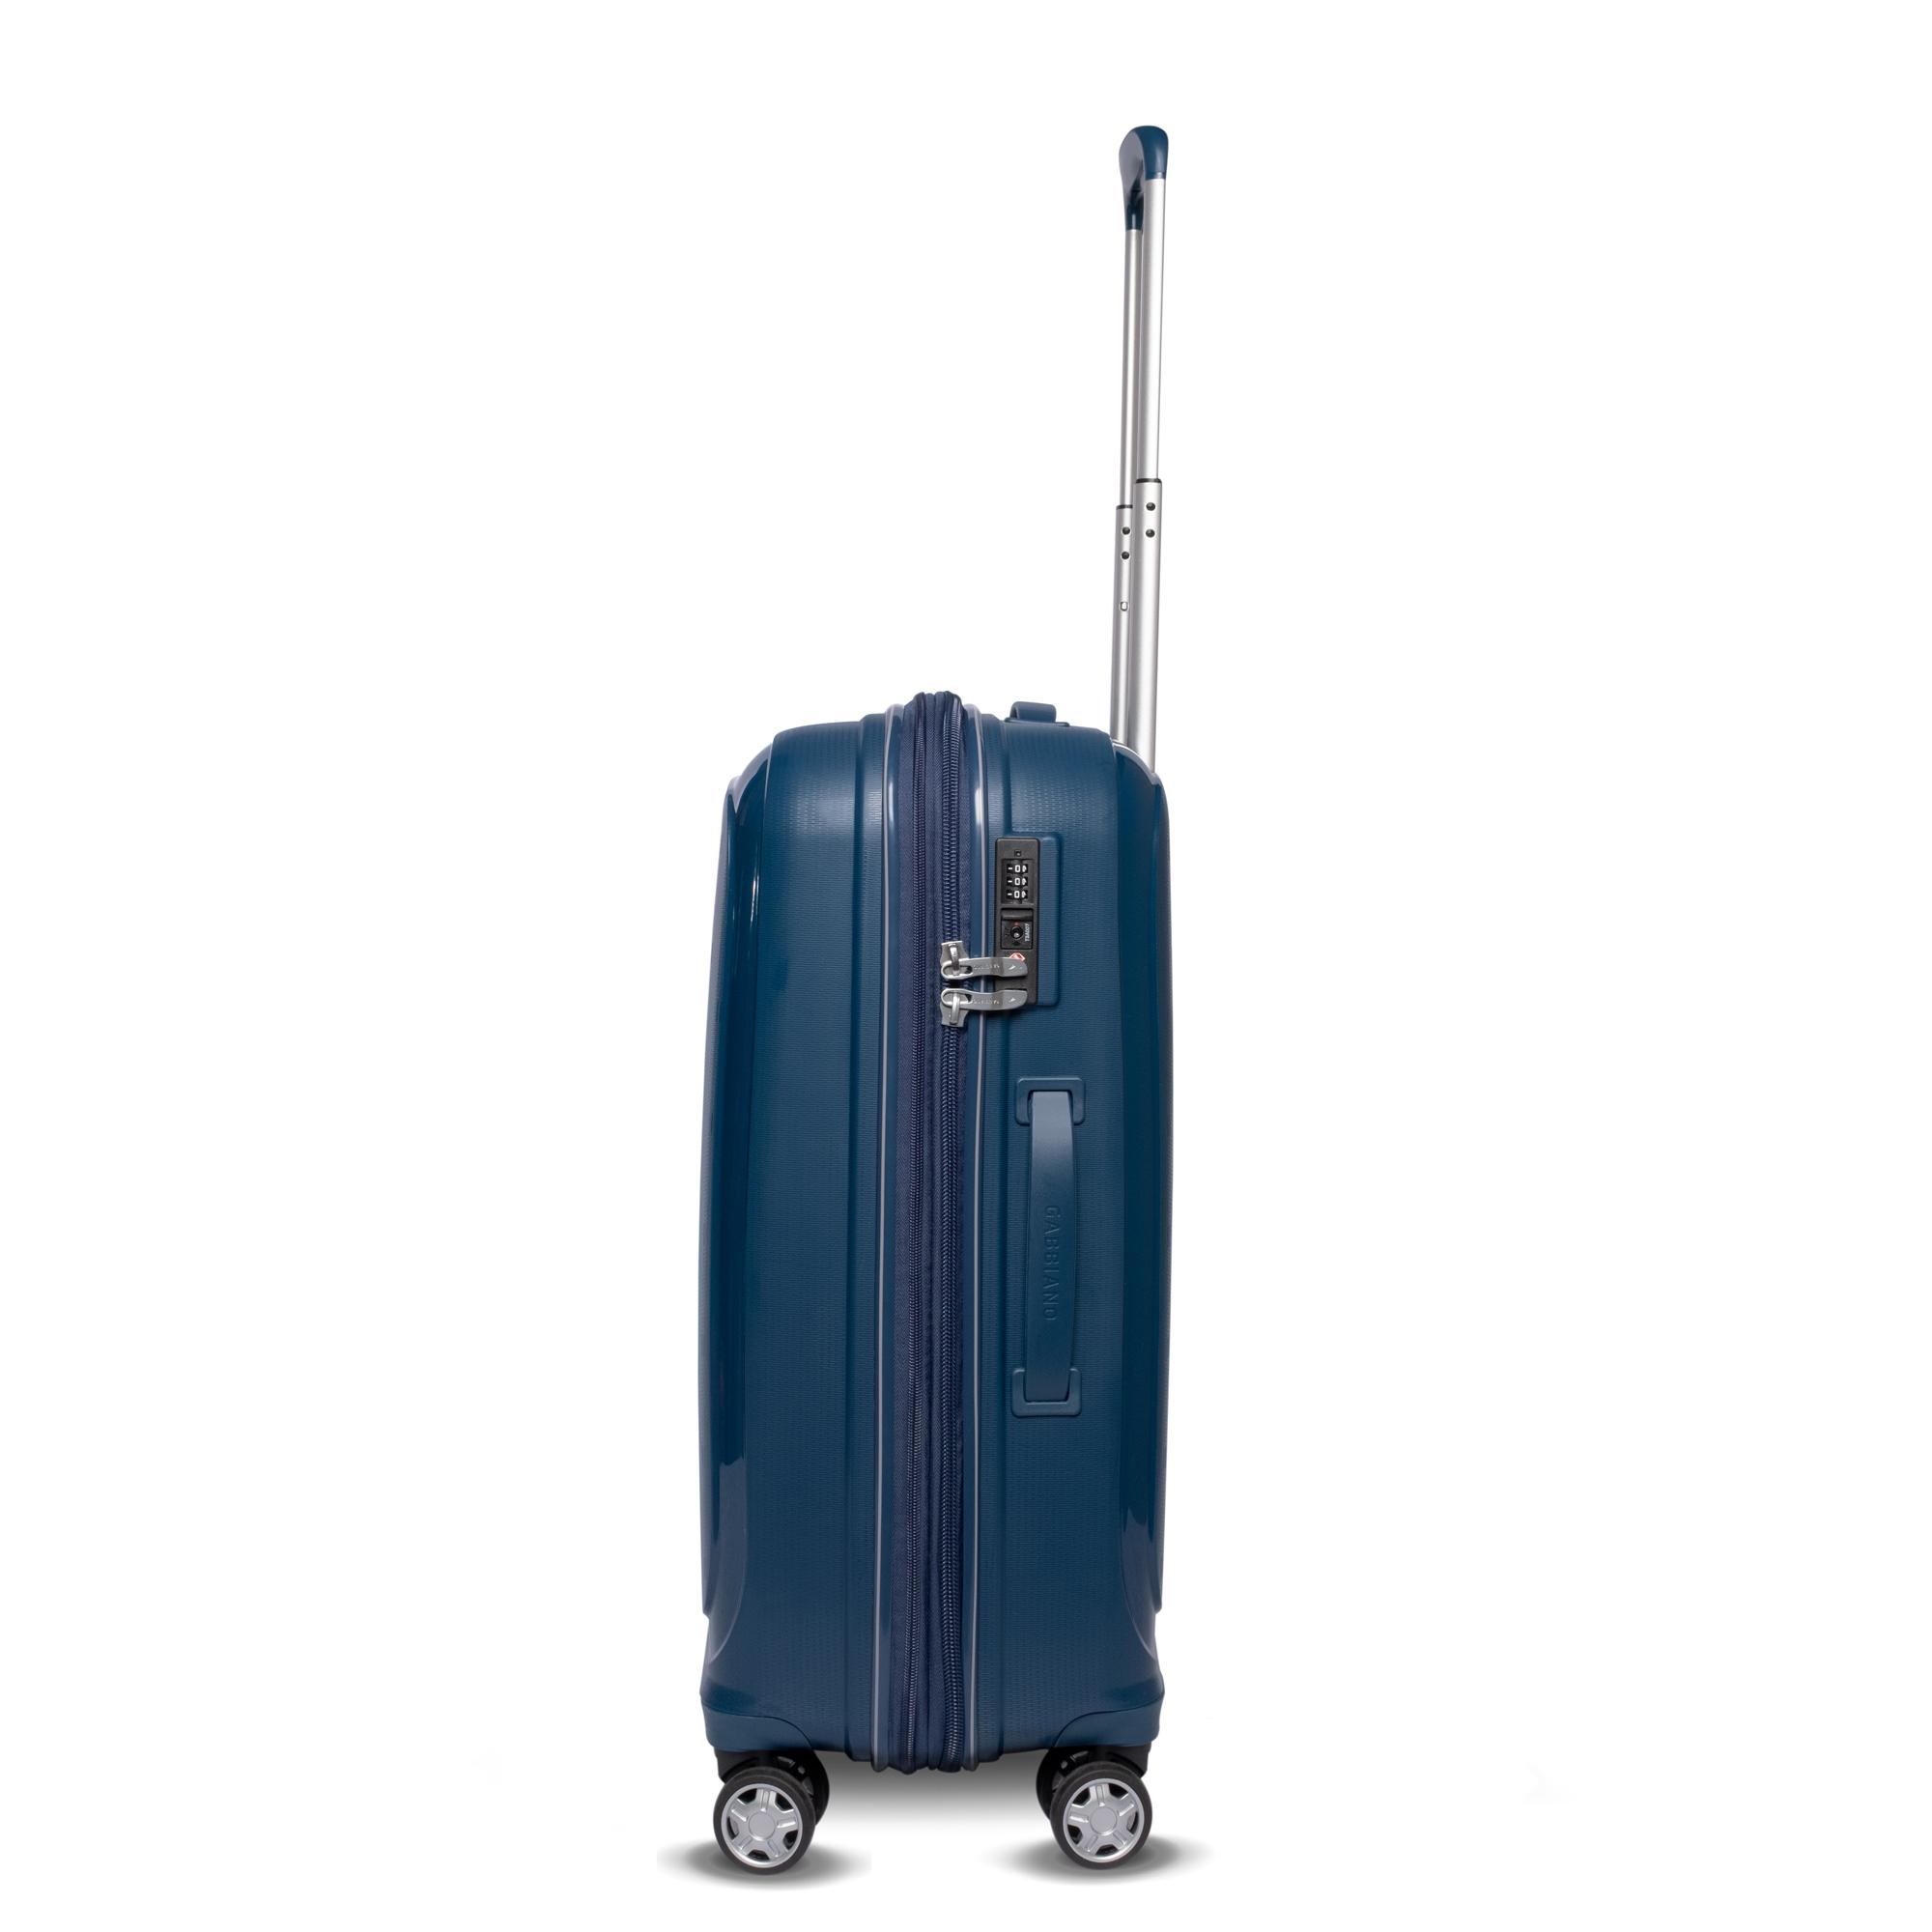 GA1150-blue-side-2k